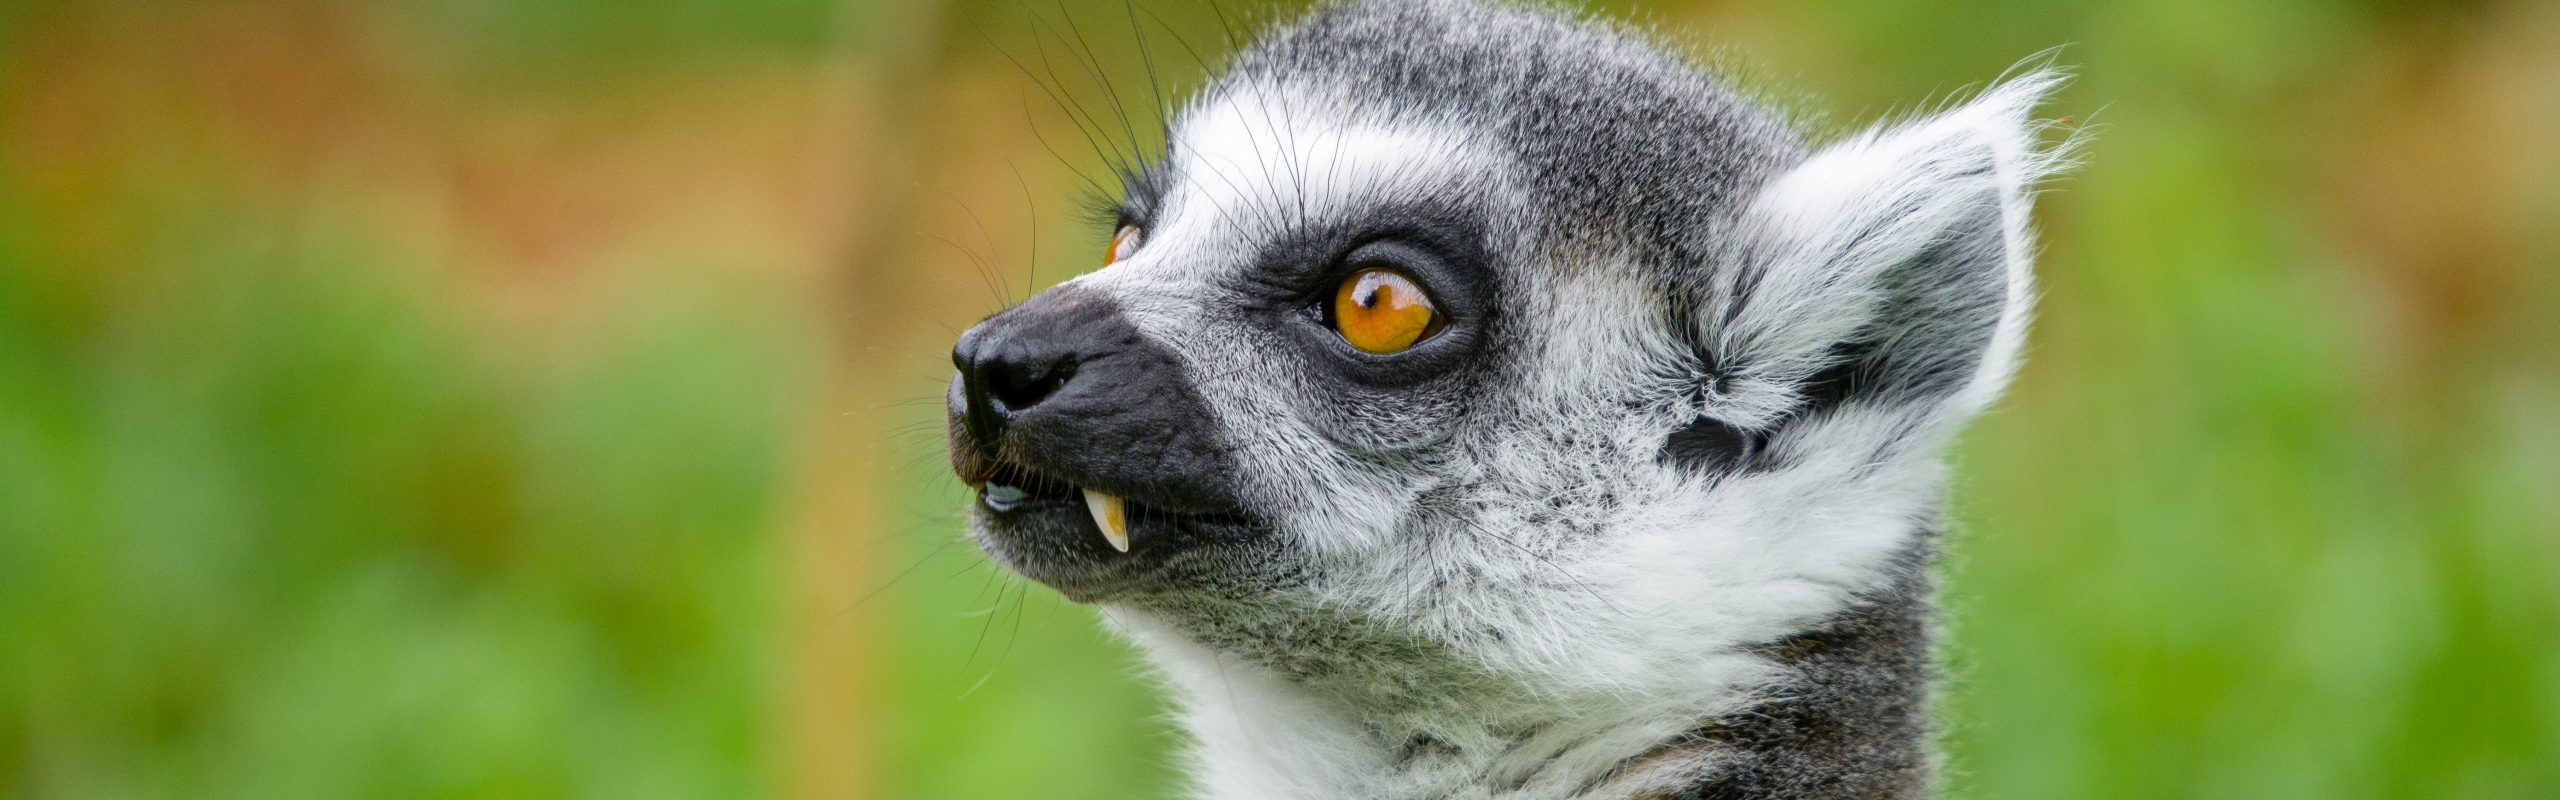 https://faunafocus.com/home/november-2018-ring-tailed-lemur/#jp-carousel-11930